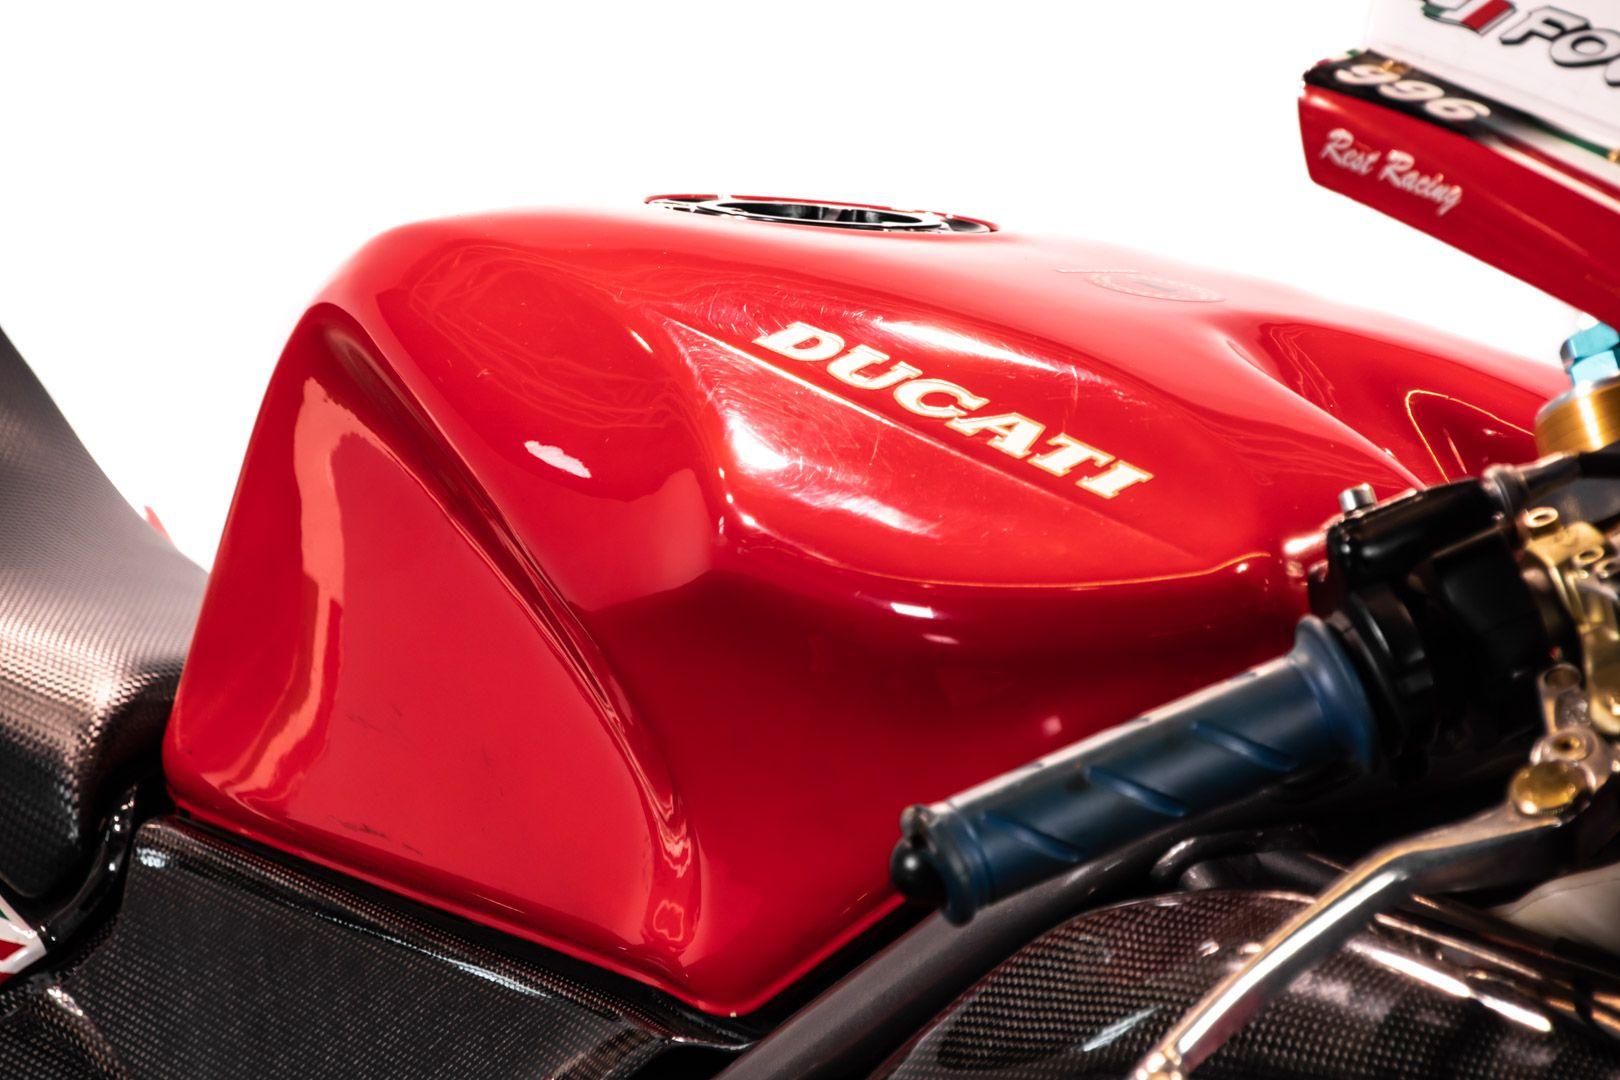 2008 Ducati 996 Fogarty Evocation 03/12 84223